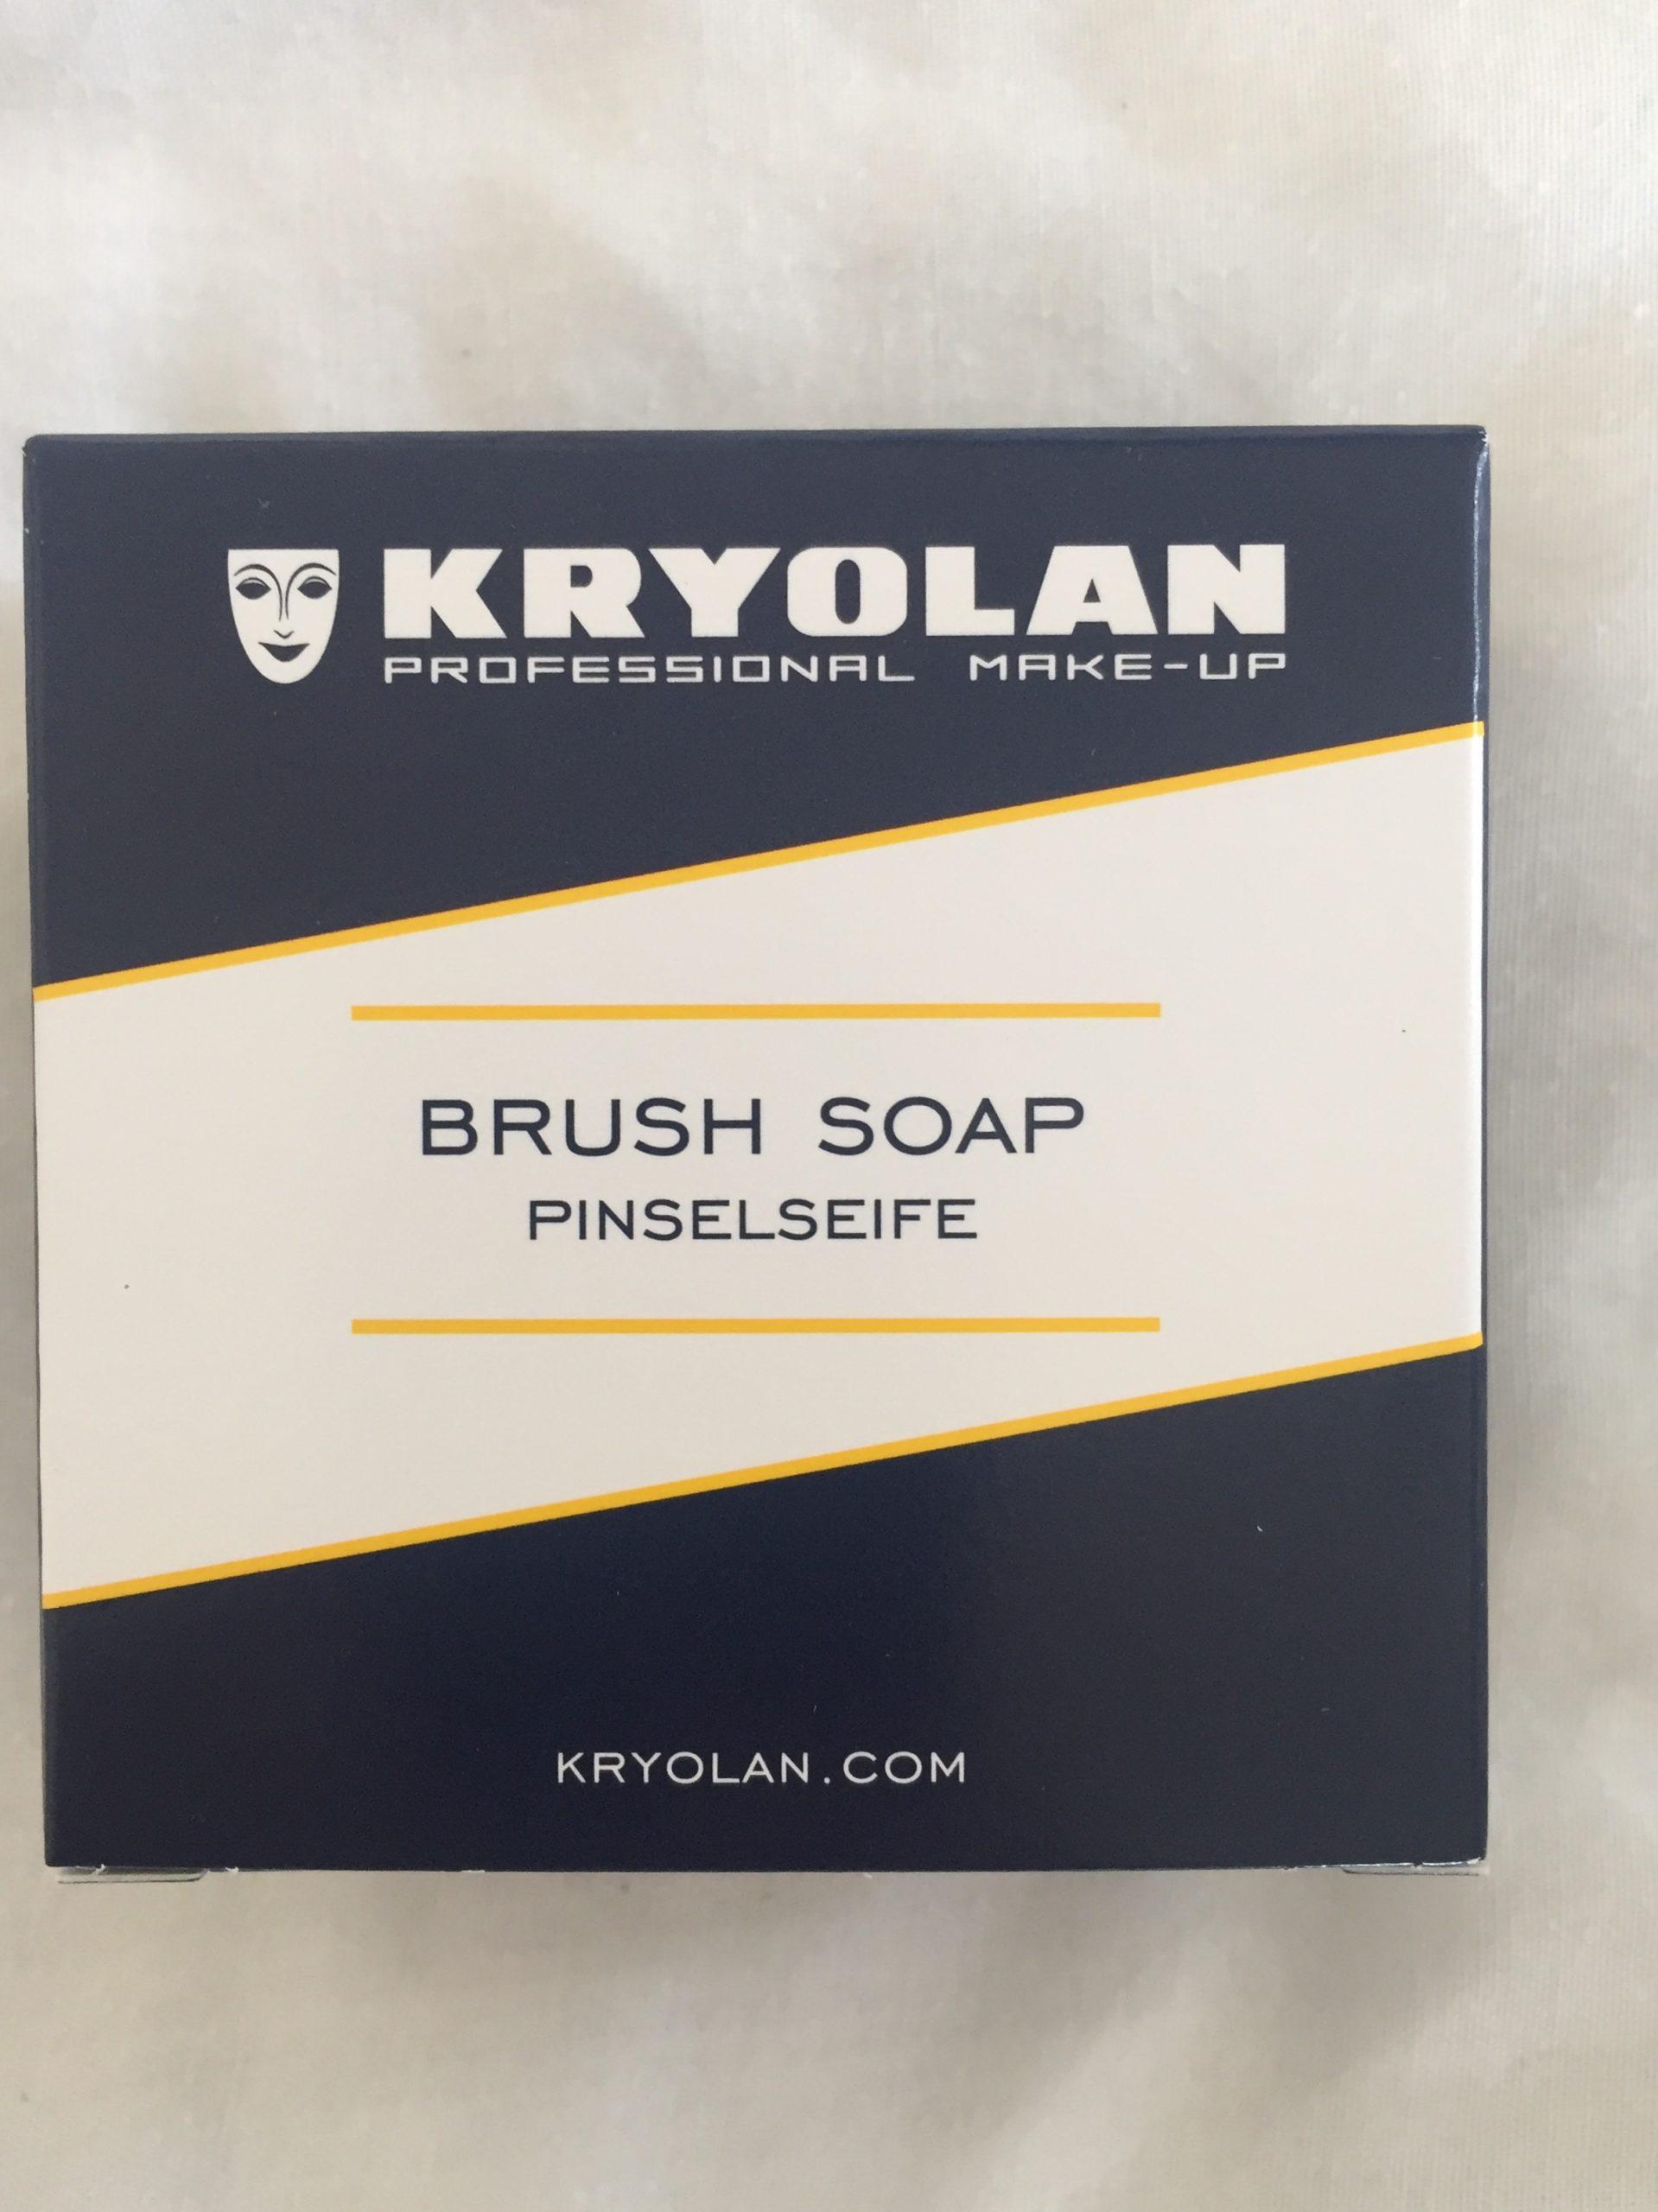 Kryolan Brush Soap-New In!